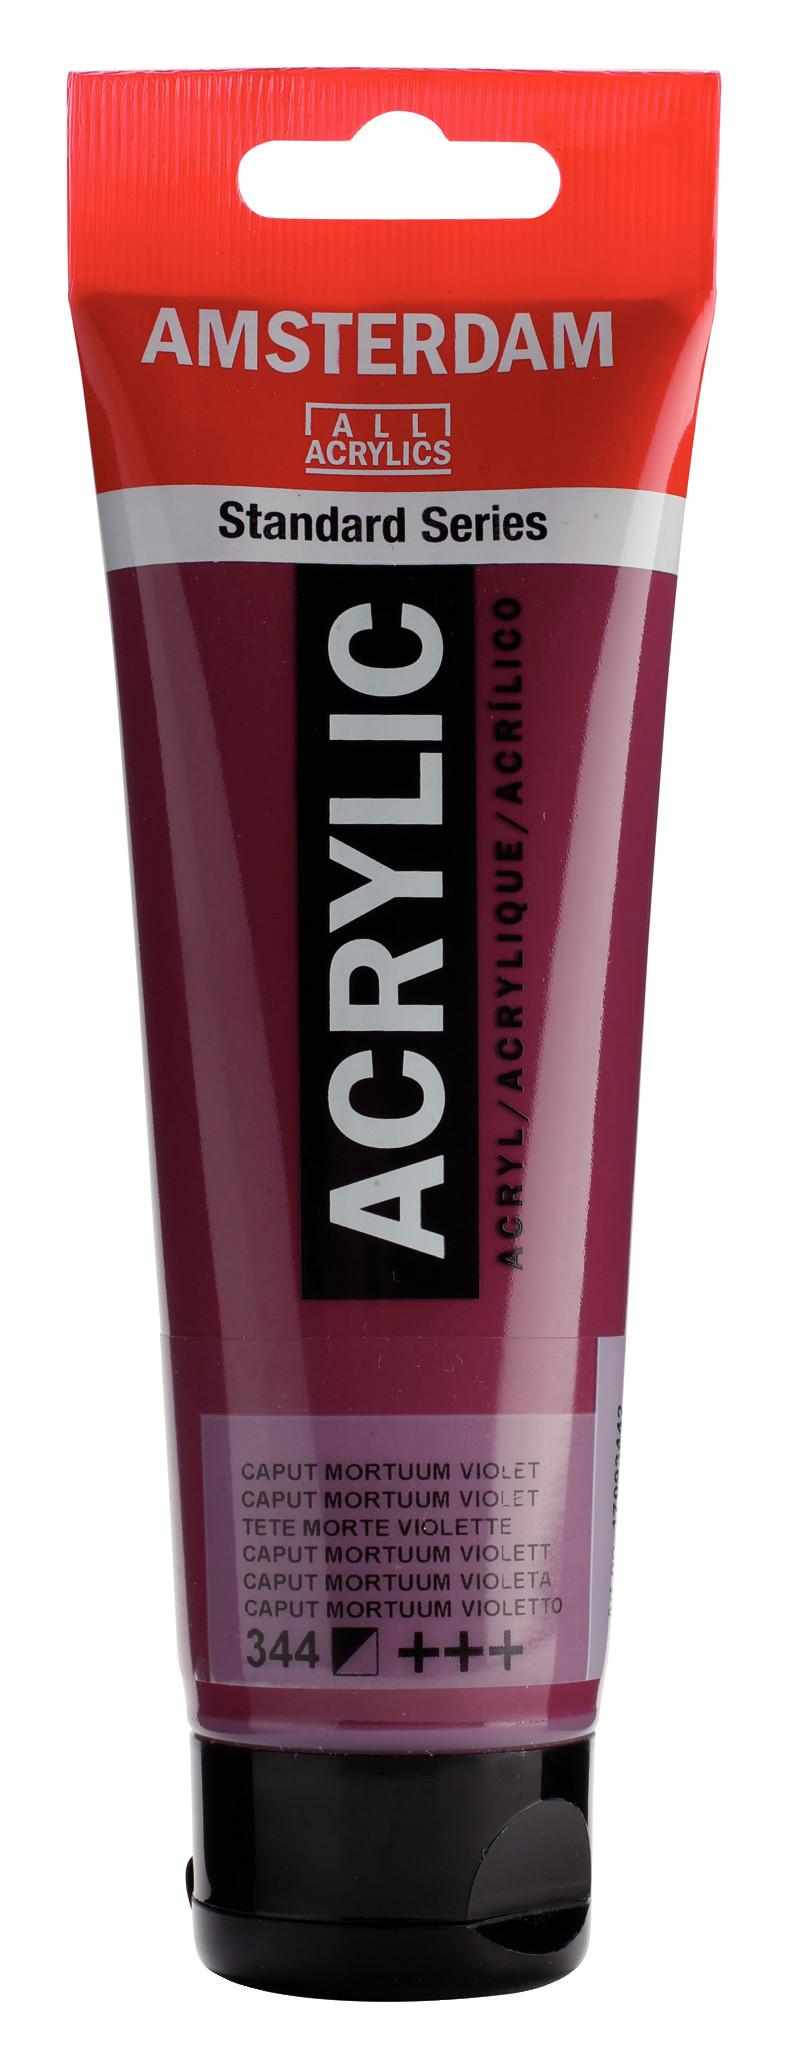 Amsterdam Standard Series Acrylic Tube 120 ml Caput mortuum violet 344